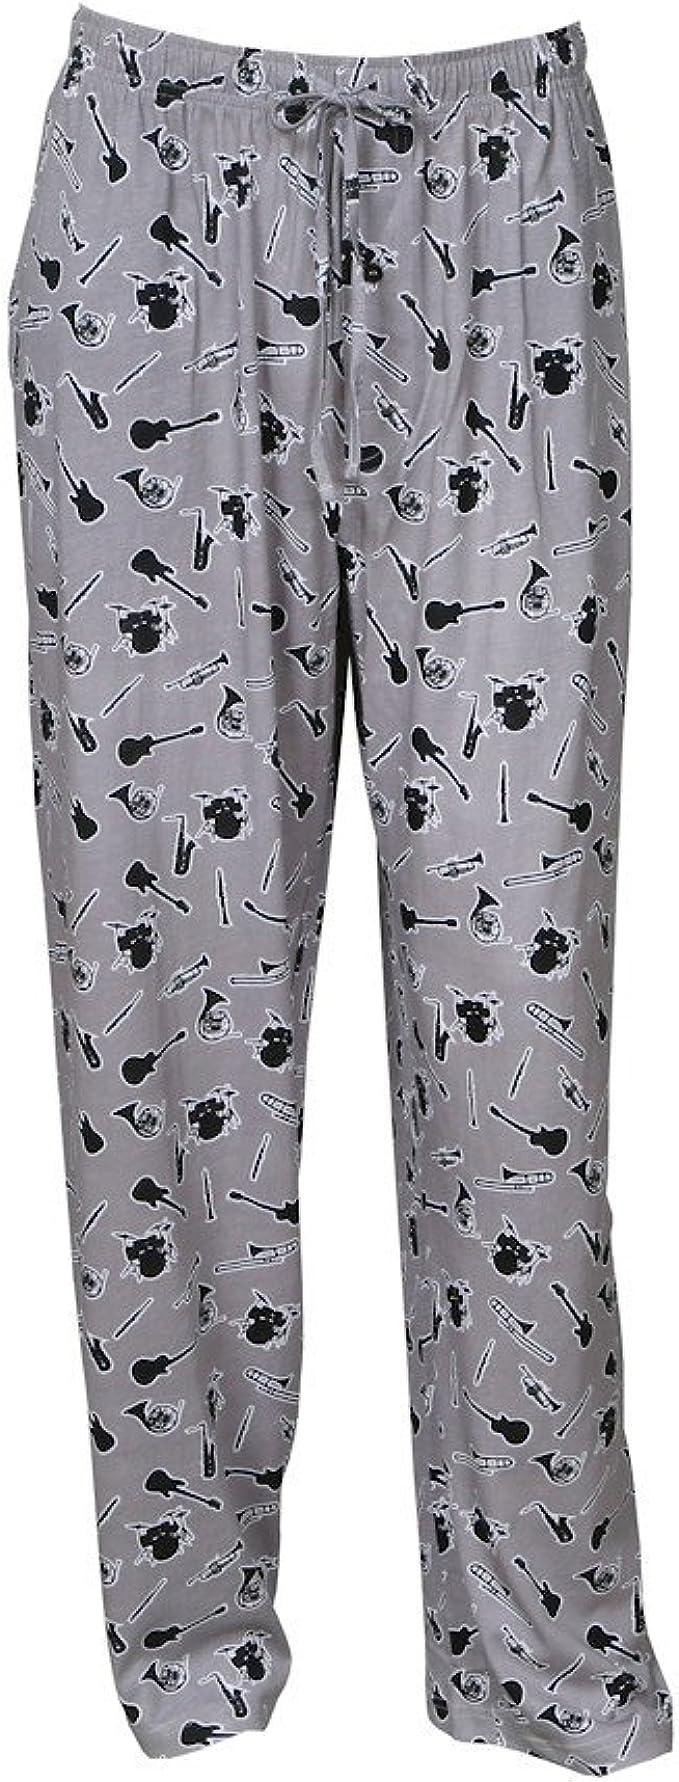 David Carey Unisex Adult Musical Instruments Lounge Pants Elastic Drawstring with Pockets Inc